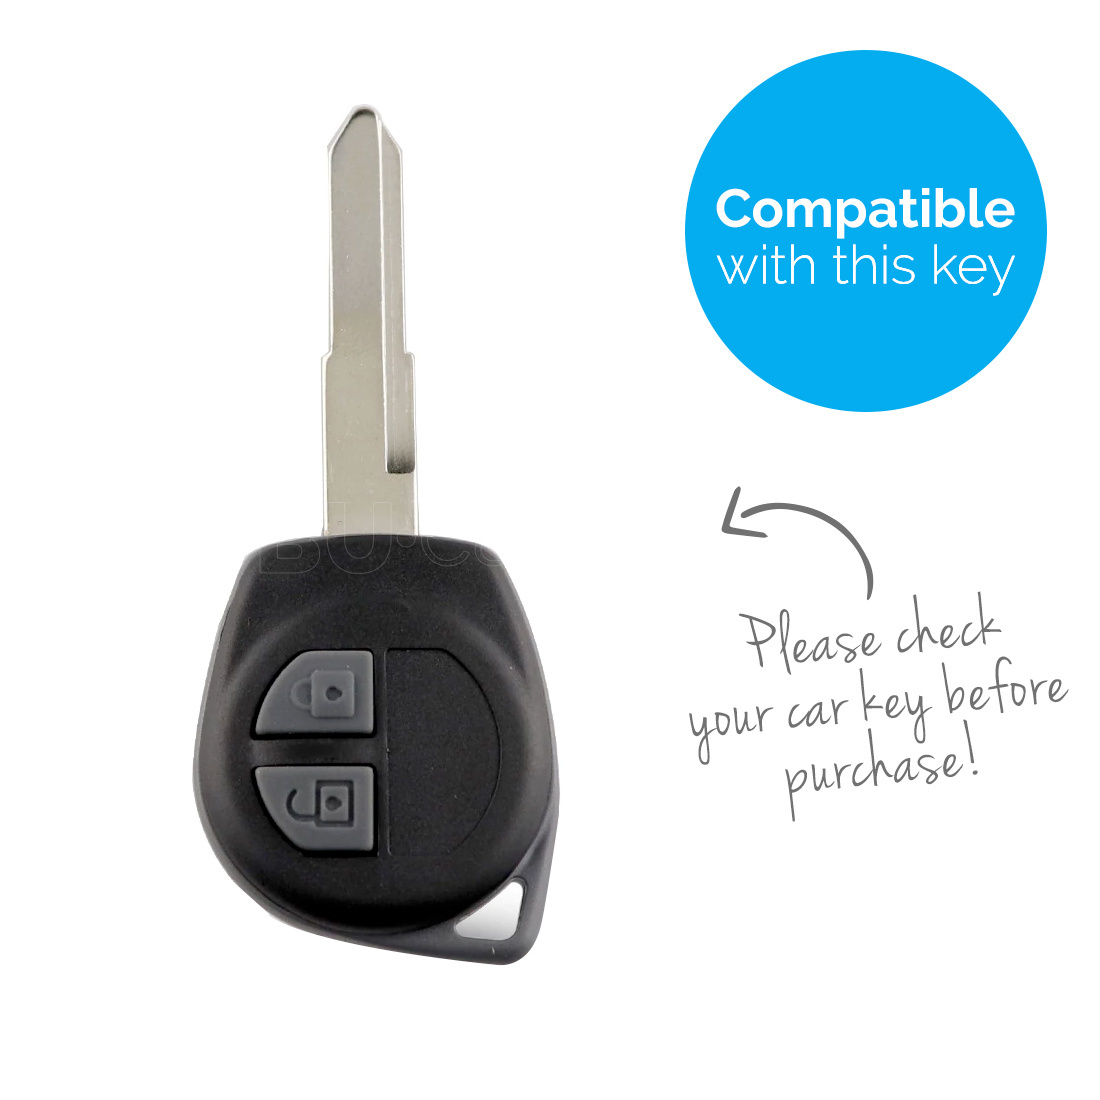 TBU car TBU car Sleutel cover compatibel met Suzuki - Silicone sleutelhoesje - beschermhoesje autosleutel - Lichtblauw